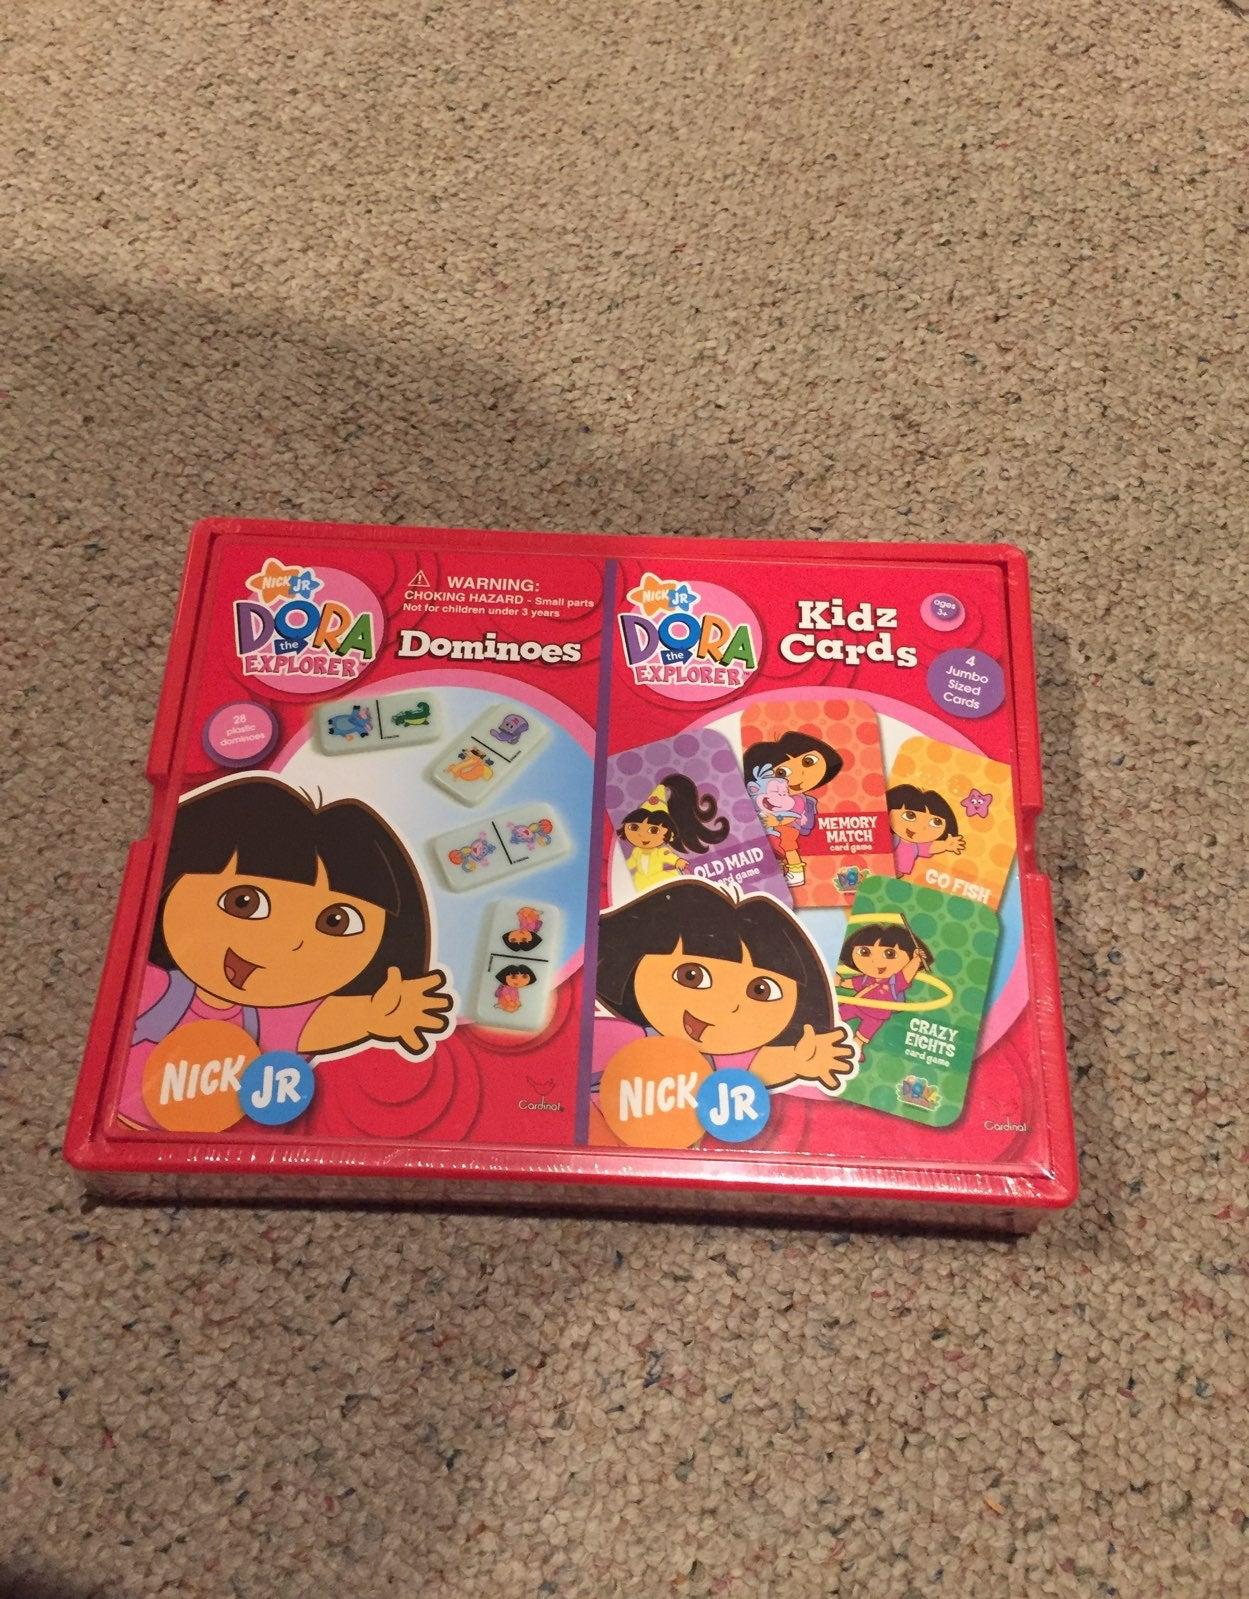 Dira Dominoes & Kidz Cards games